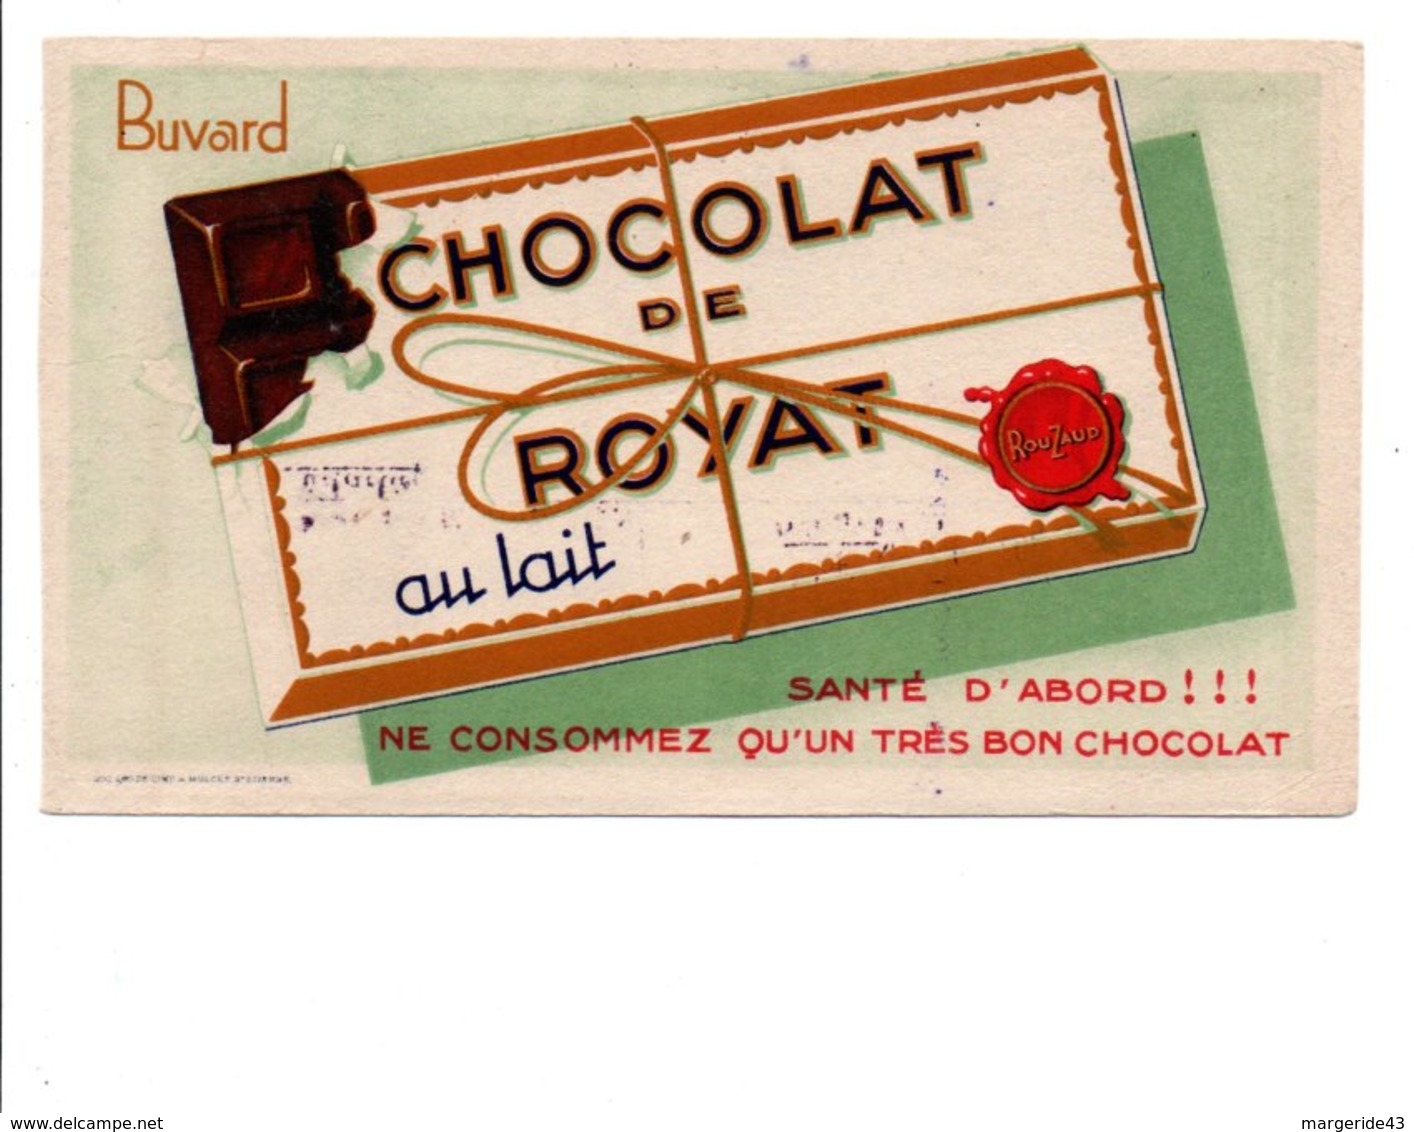 BUVARD CHOCOLAT DE ROYAT - Blotters